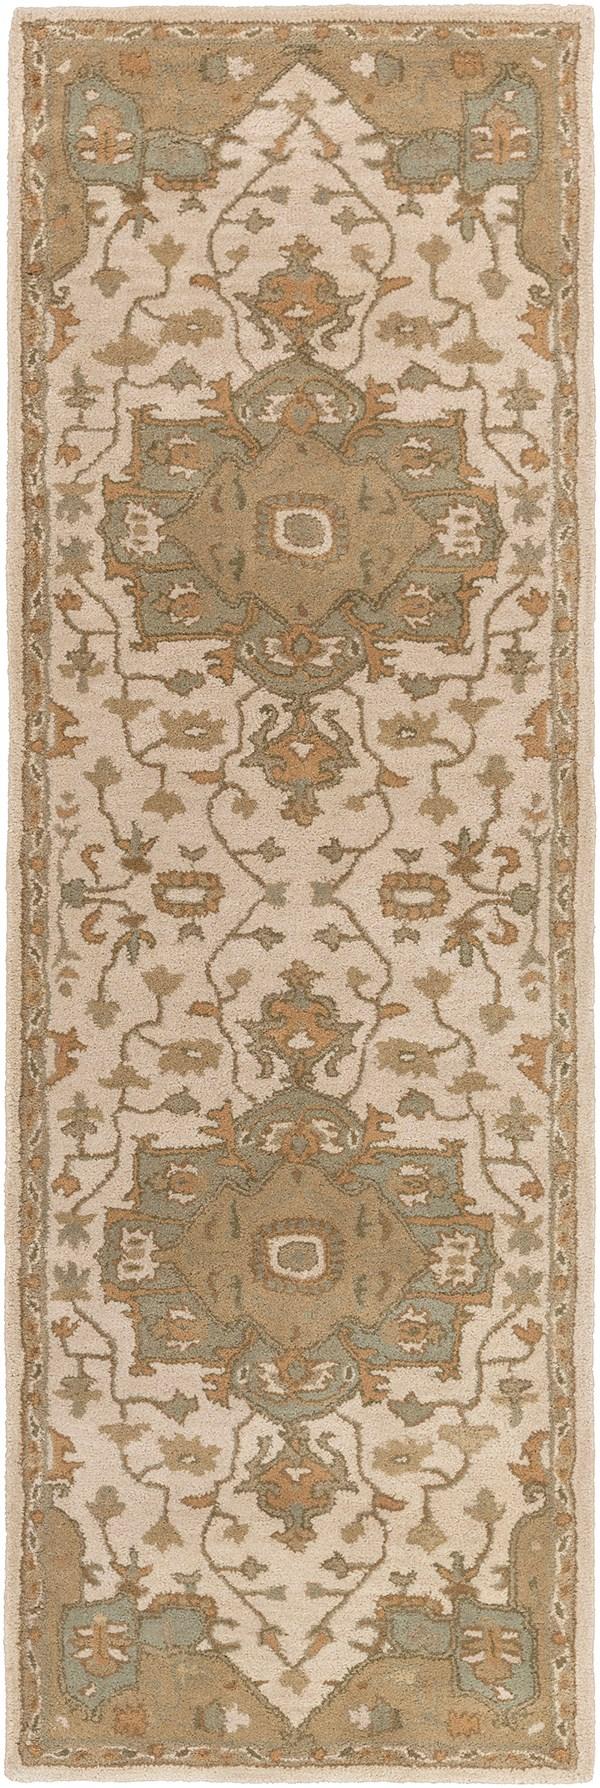 Khaki, Medium Gray, Dark Brown Traditional / Oriental Area Rug